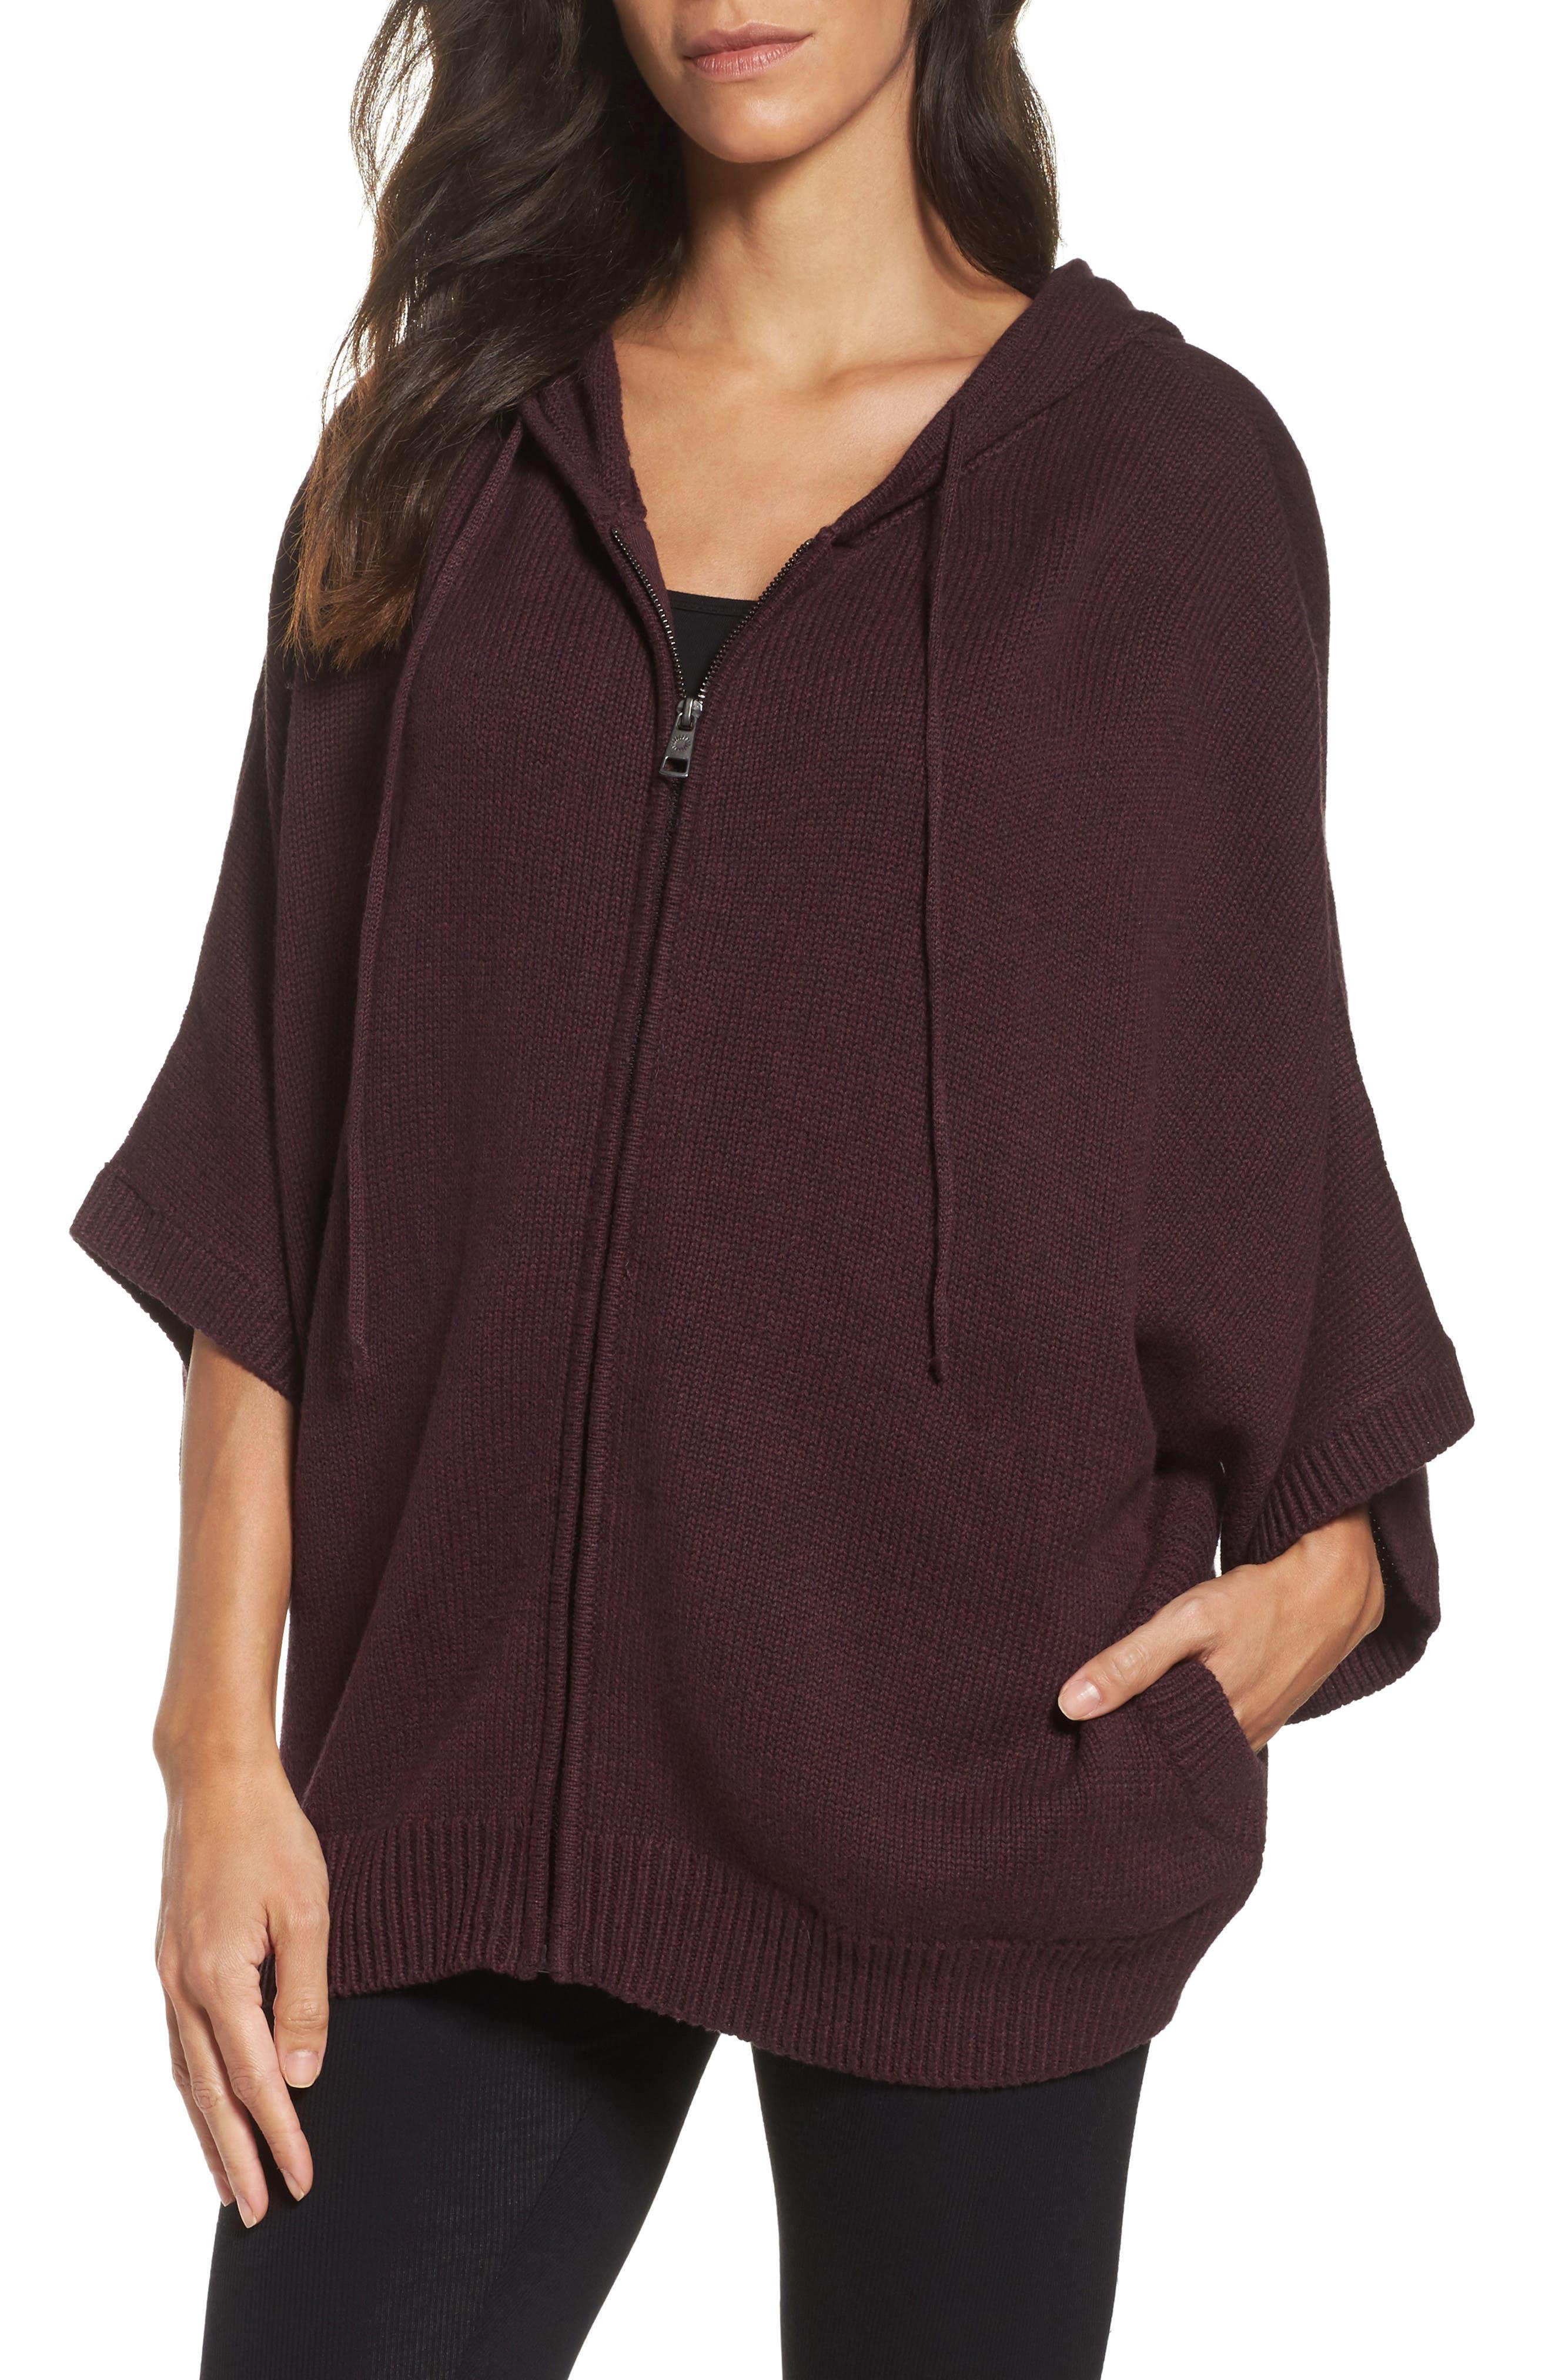 Main Image - UGG® Sweater Knit Poncho